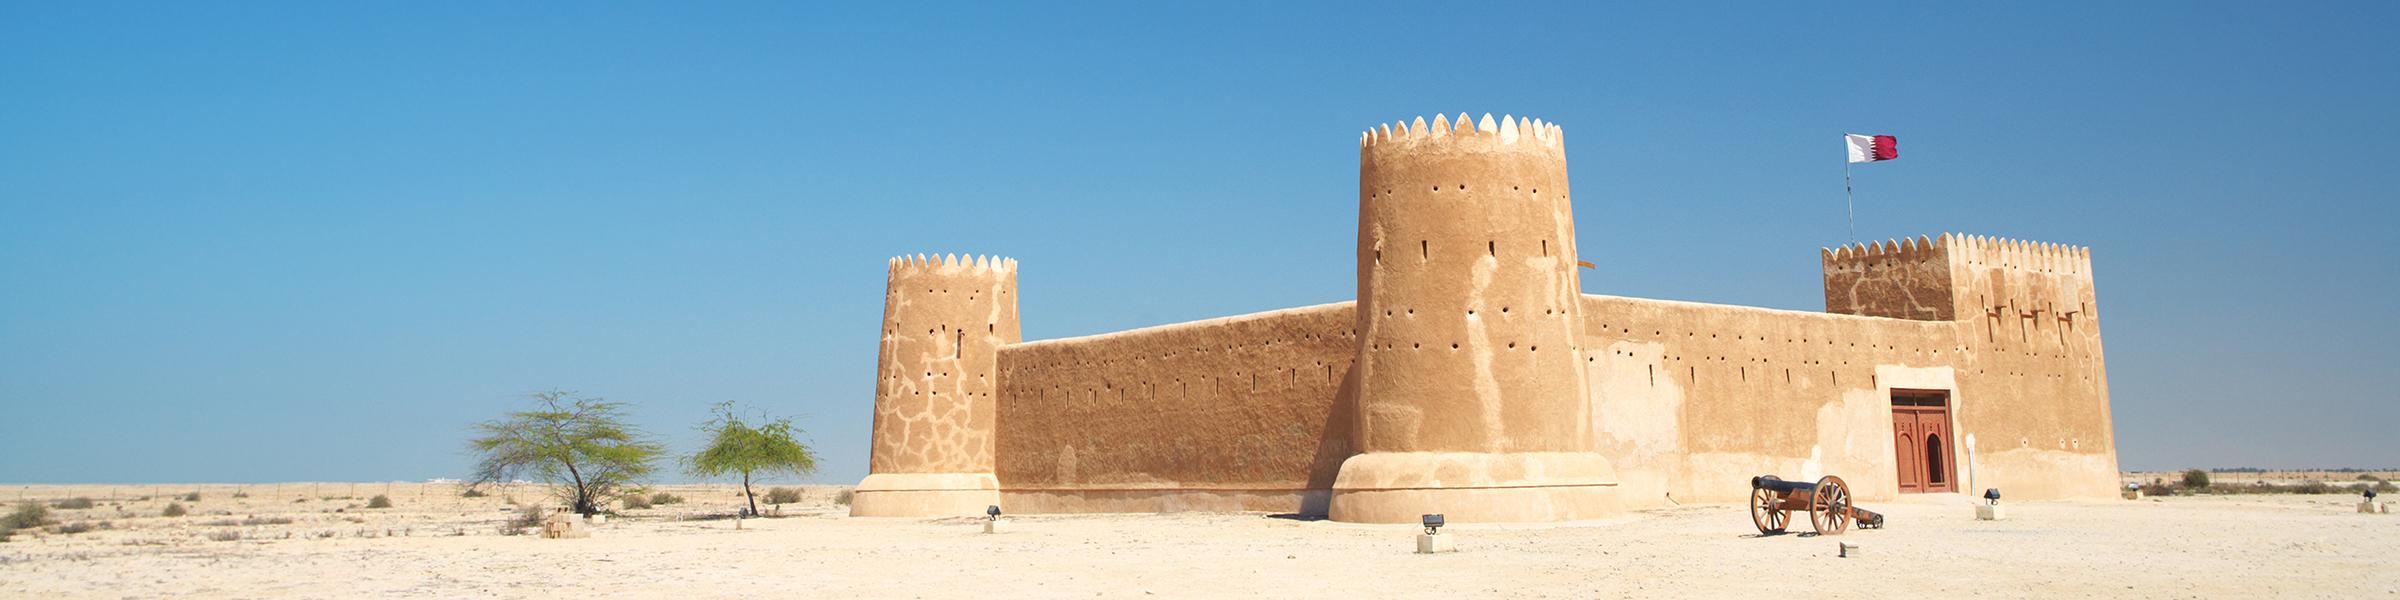 Qatar Al Zubara Fort